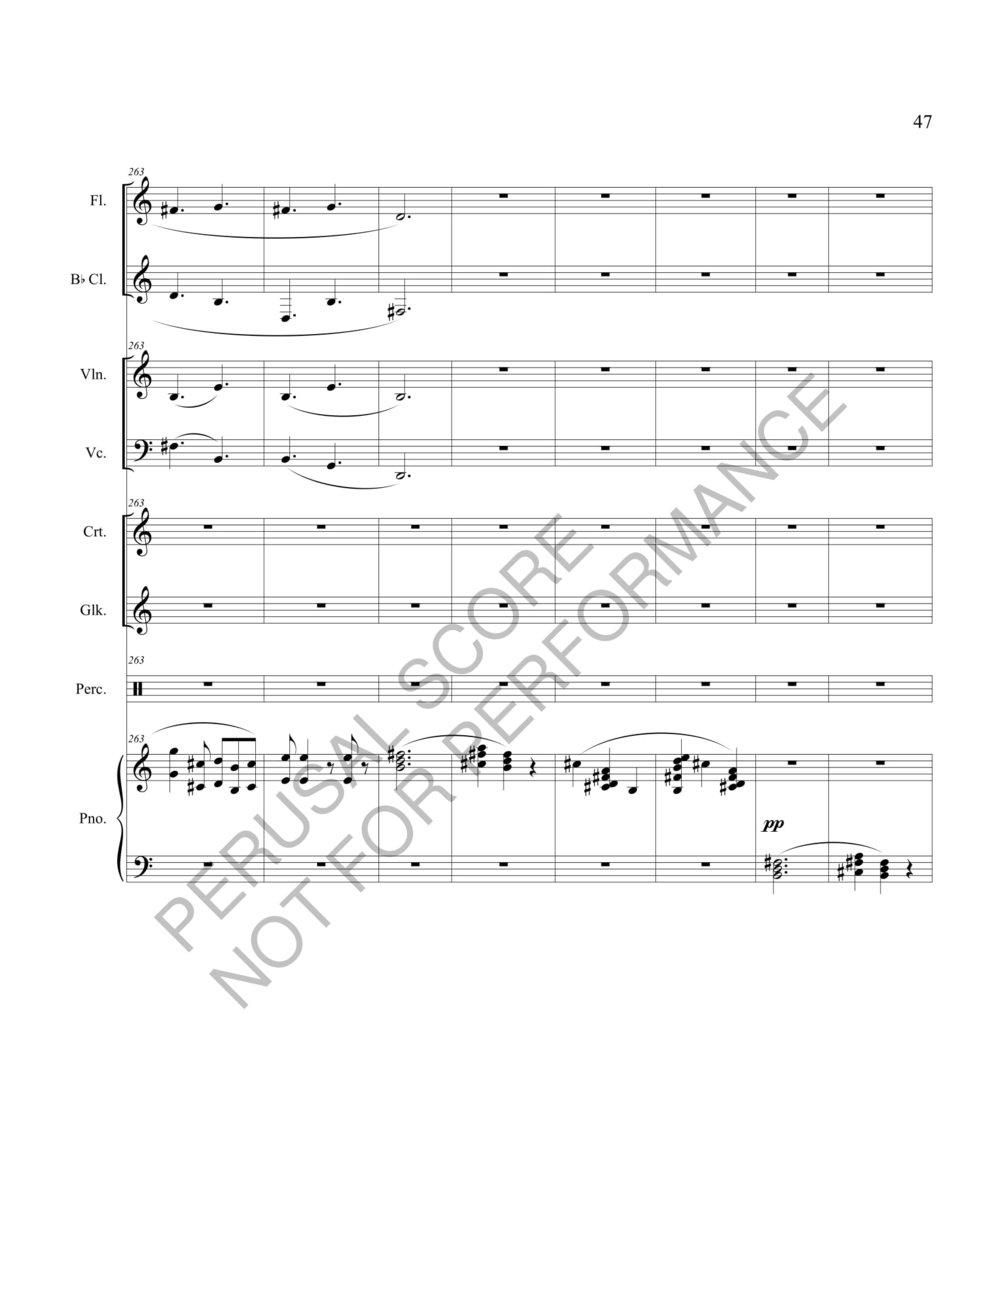 Boyd Terra Liberi Score-watermark-53.jpg